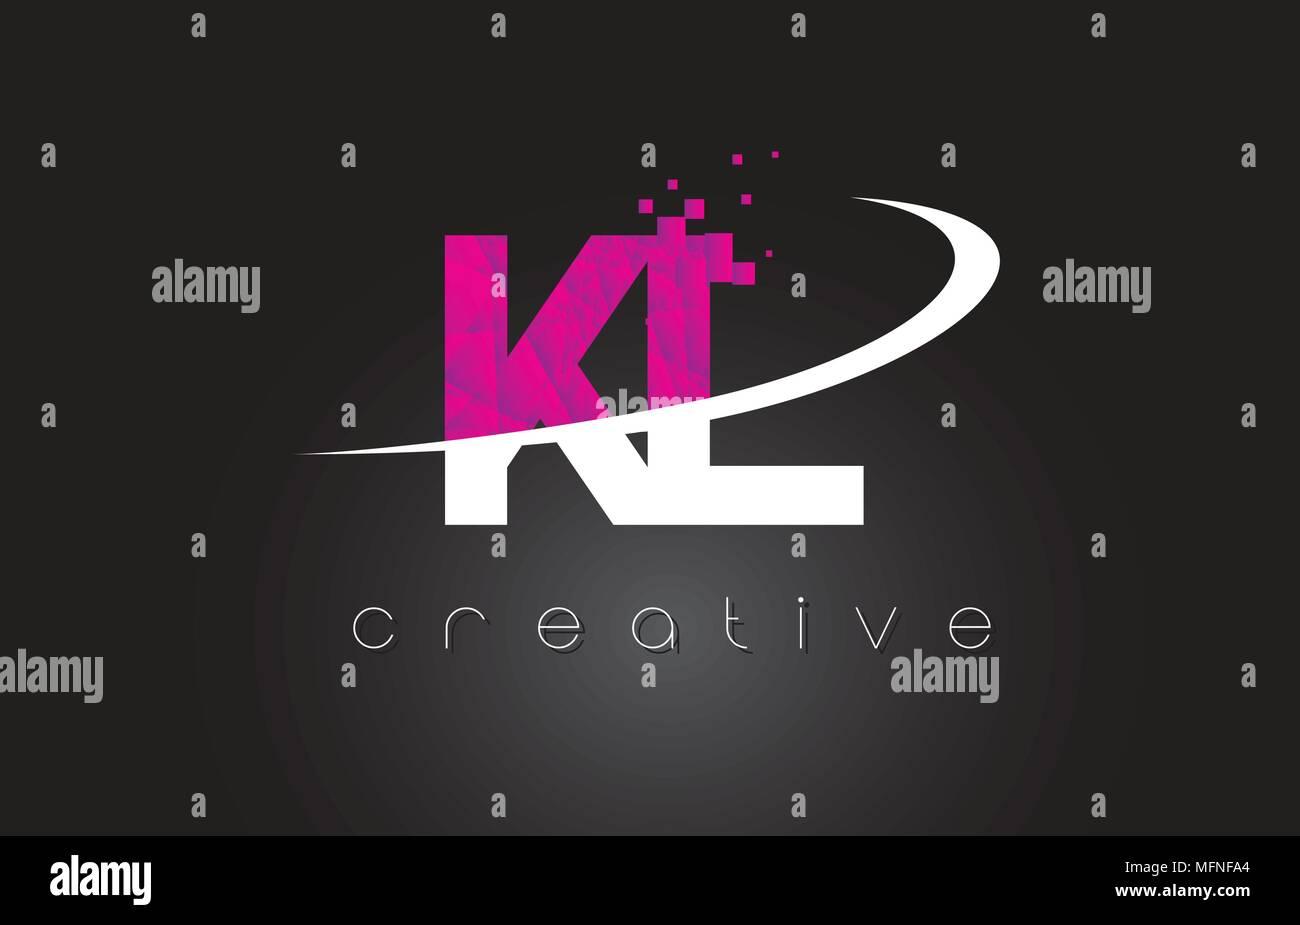 KL K L Creative Letters Design. White Pink Letter Vector Illustration. - Stock Vector